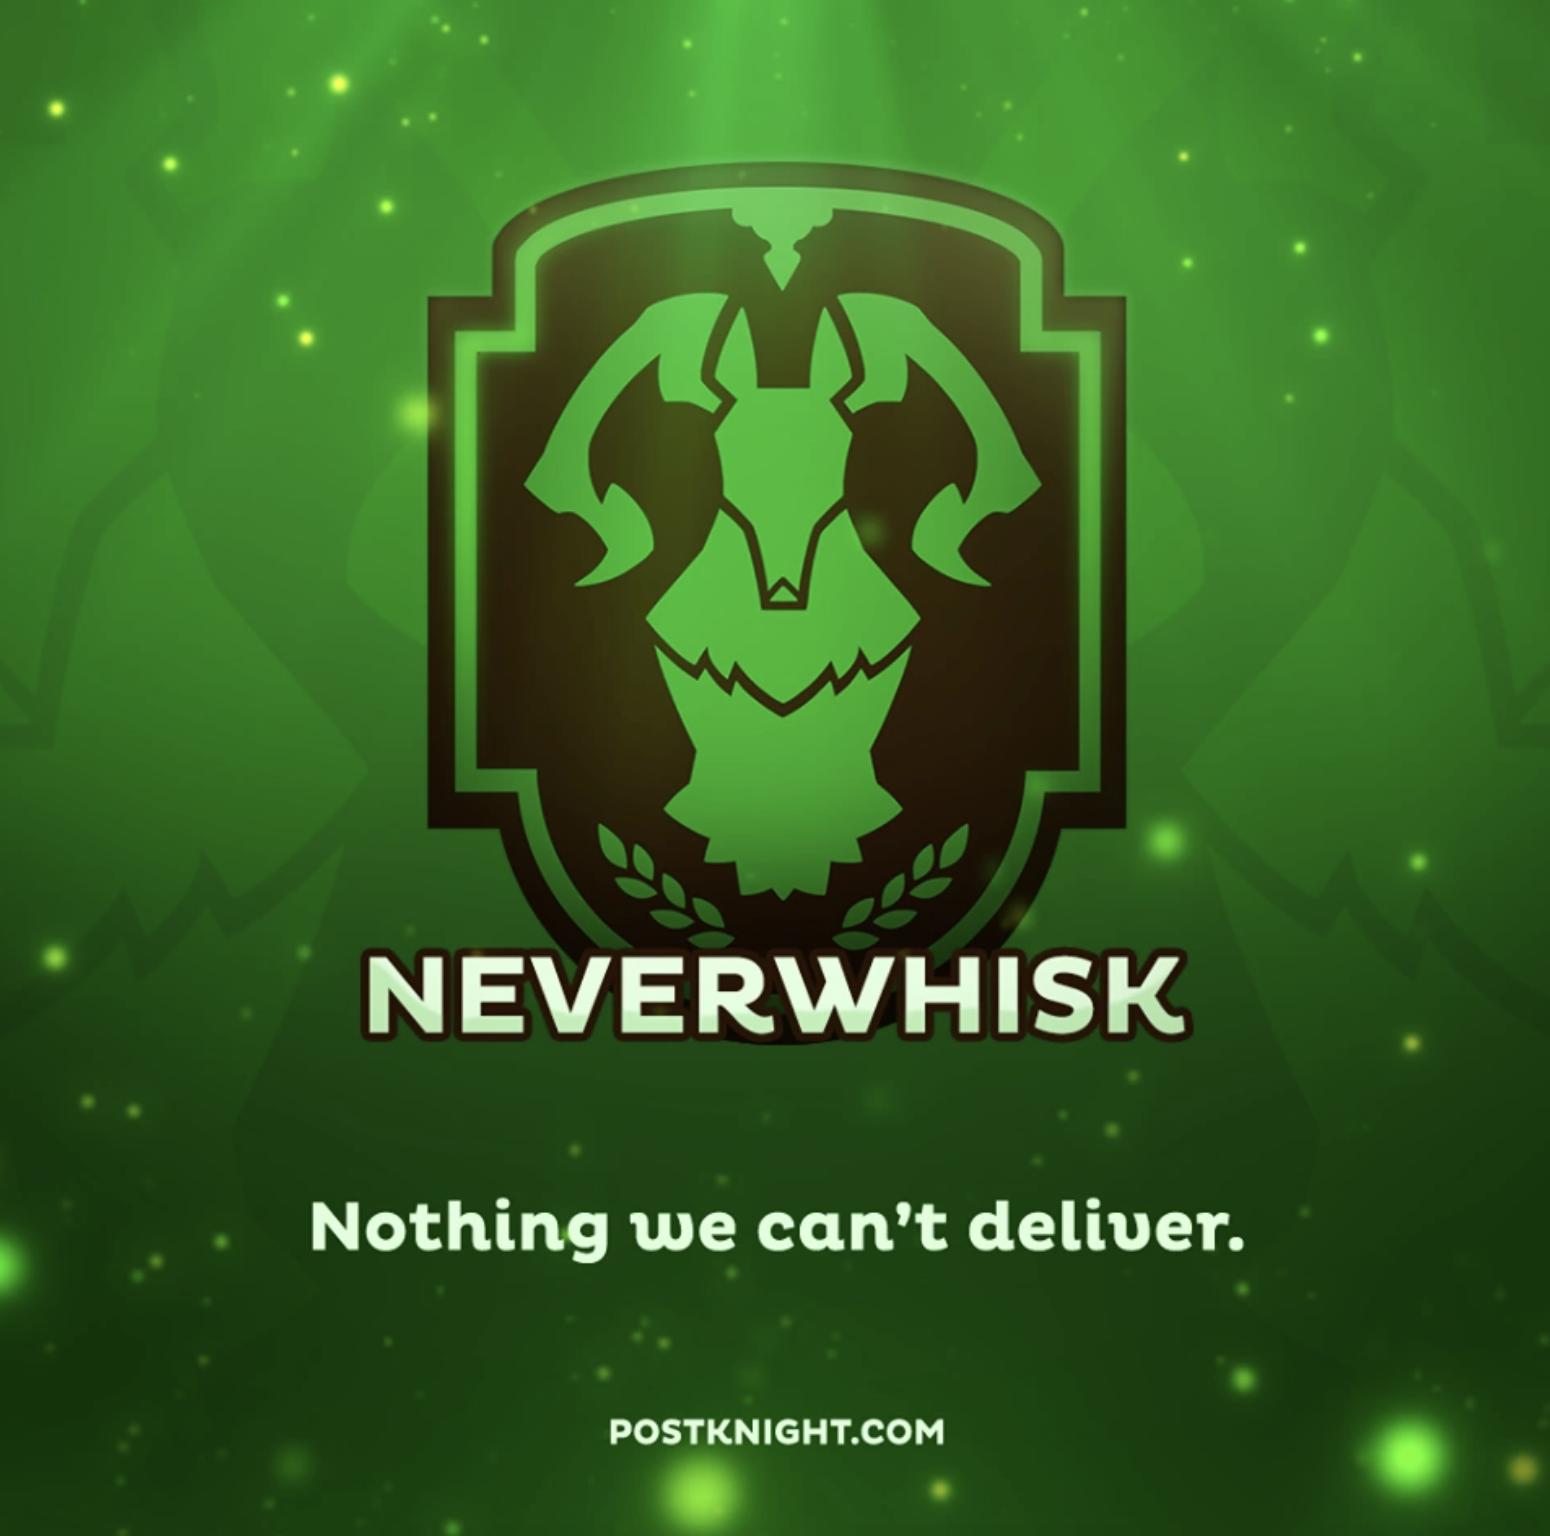 Neverwhisk-Postknight_Carprincess